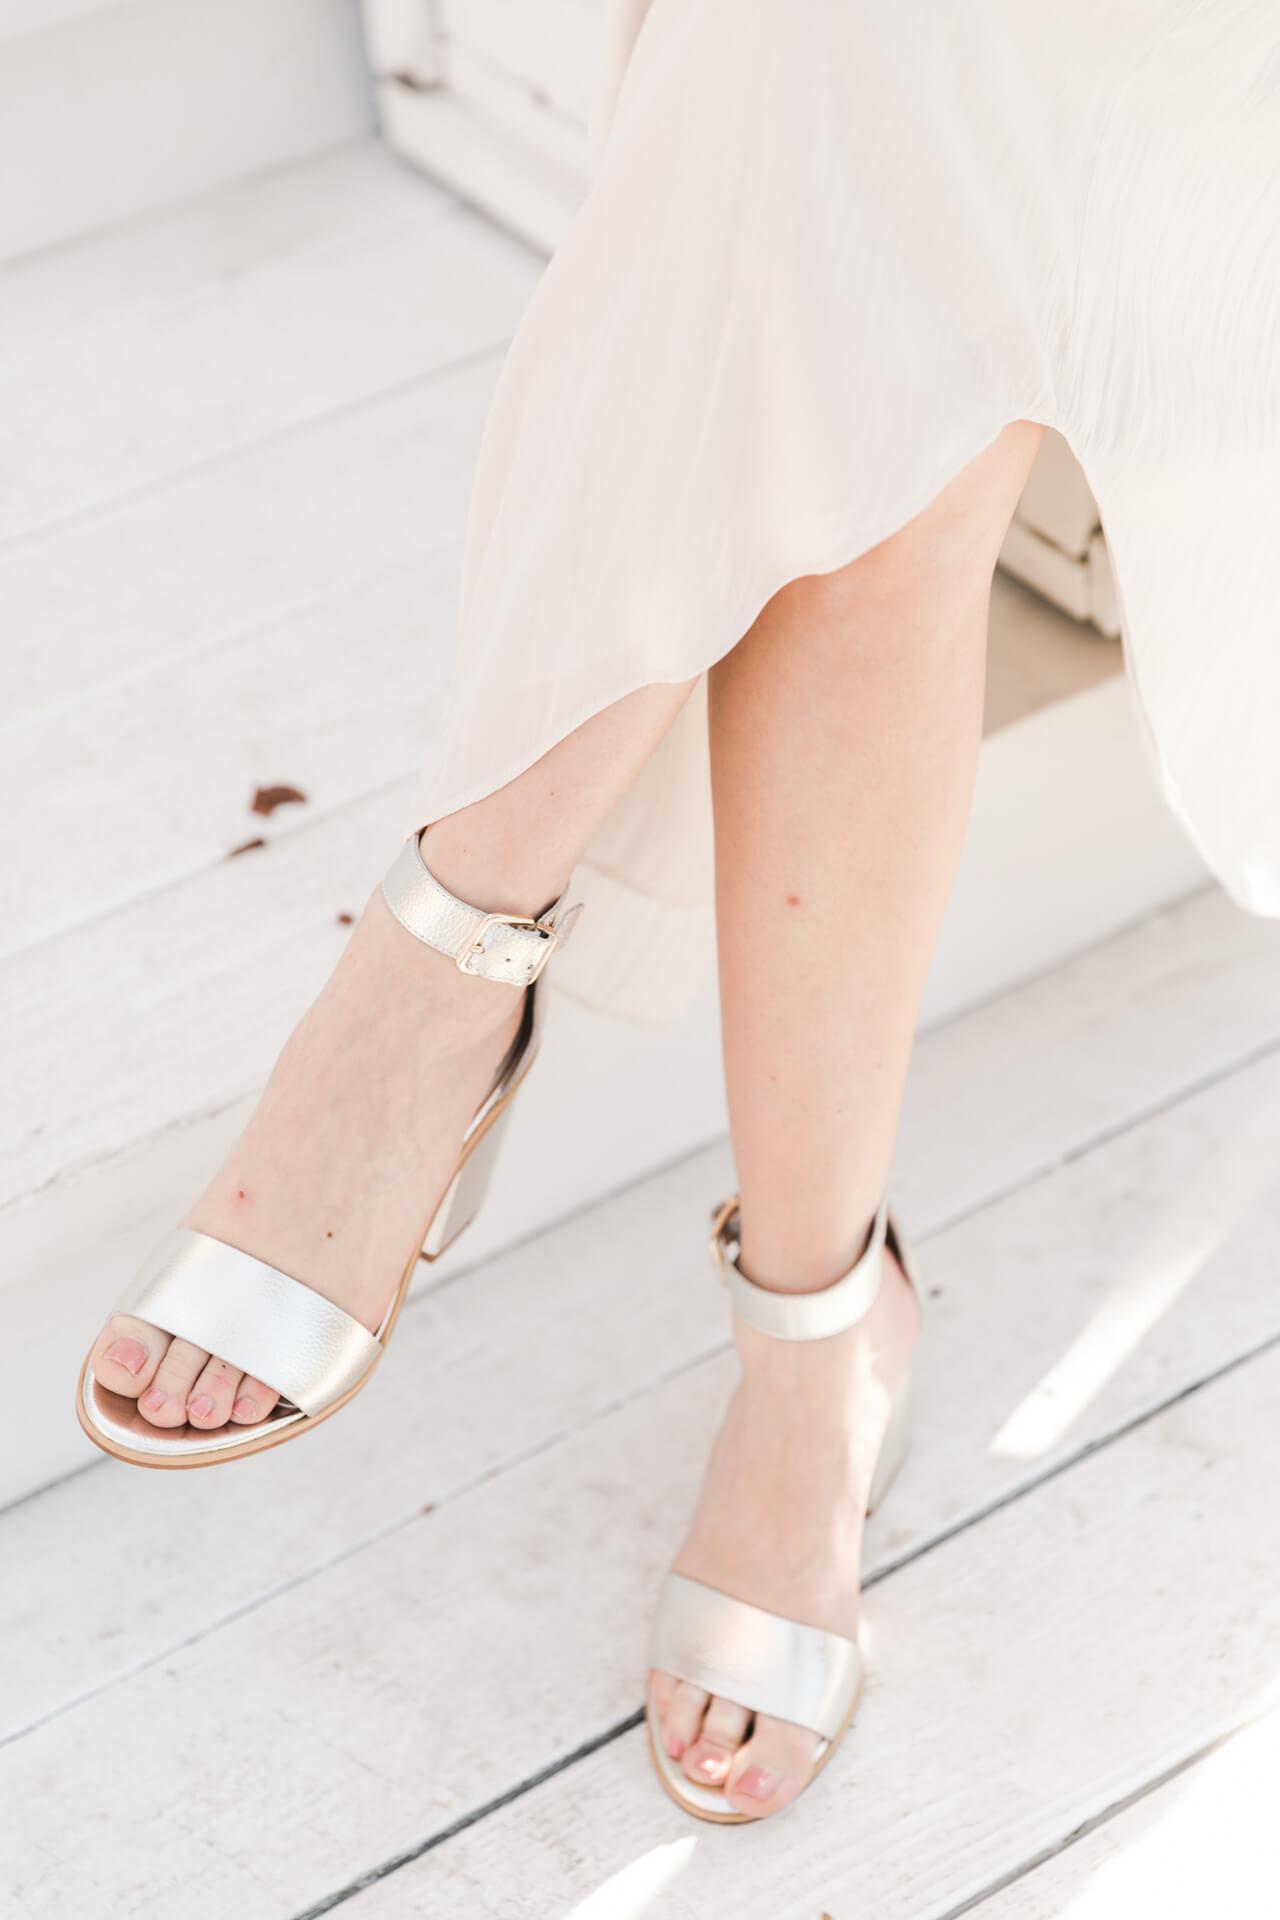 beige skirt with silver sandal heels